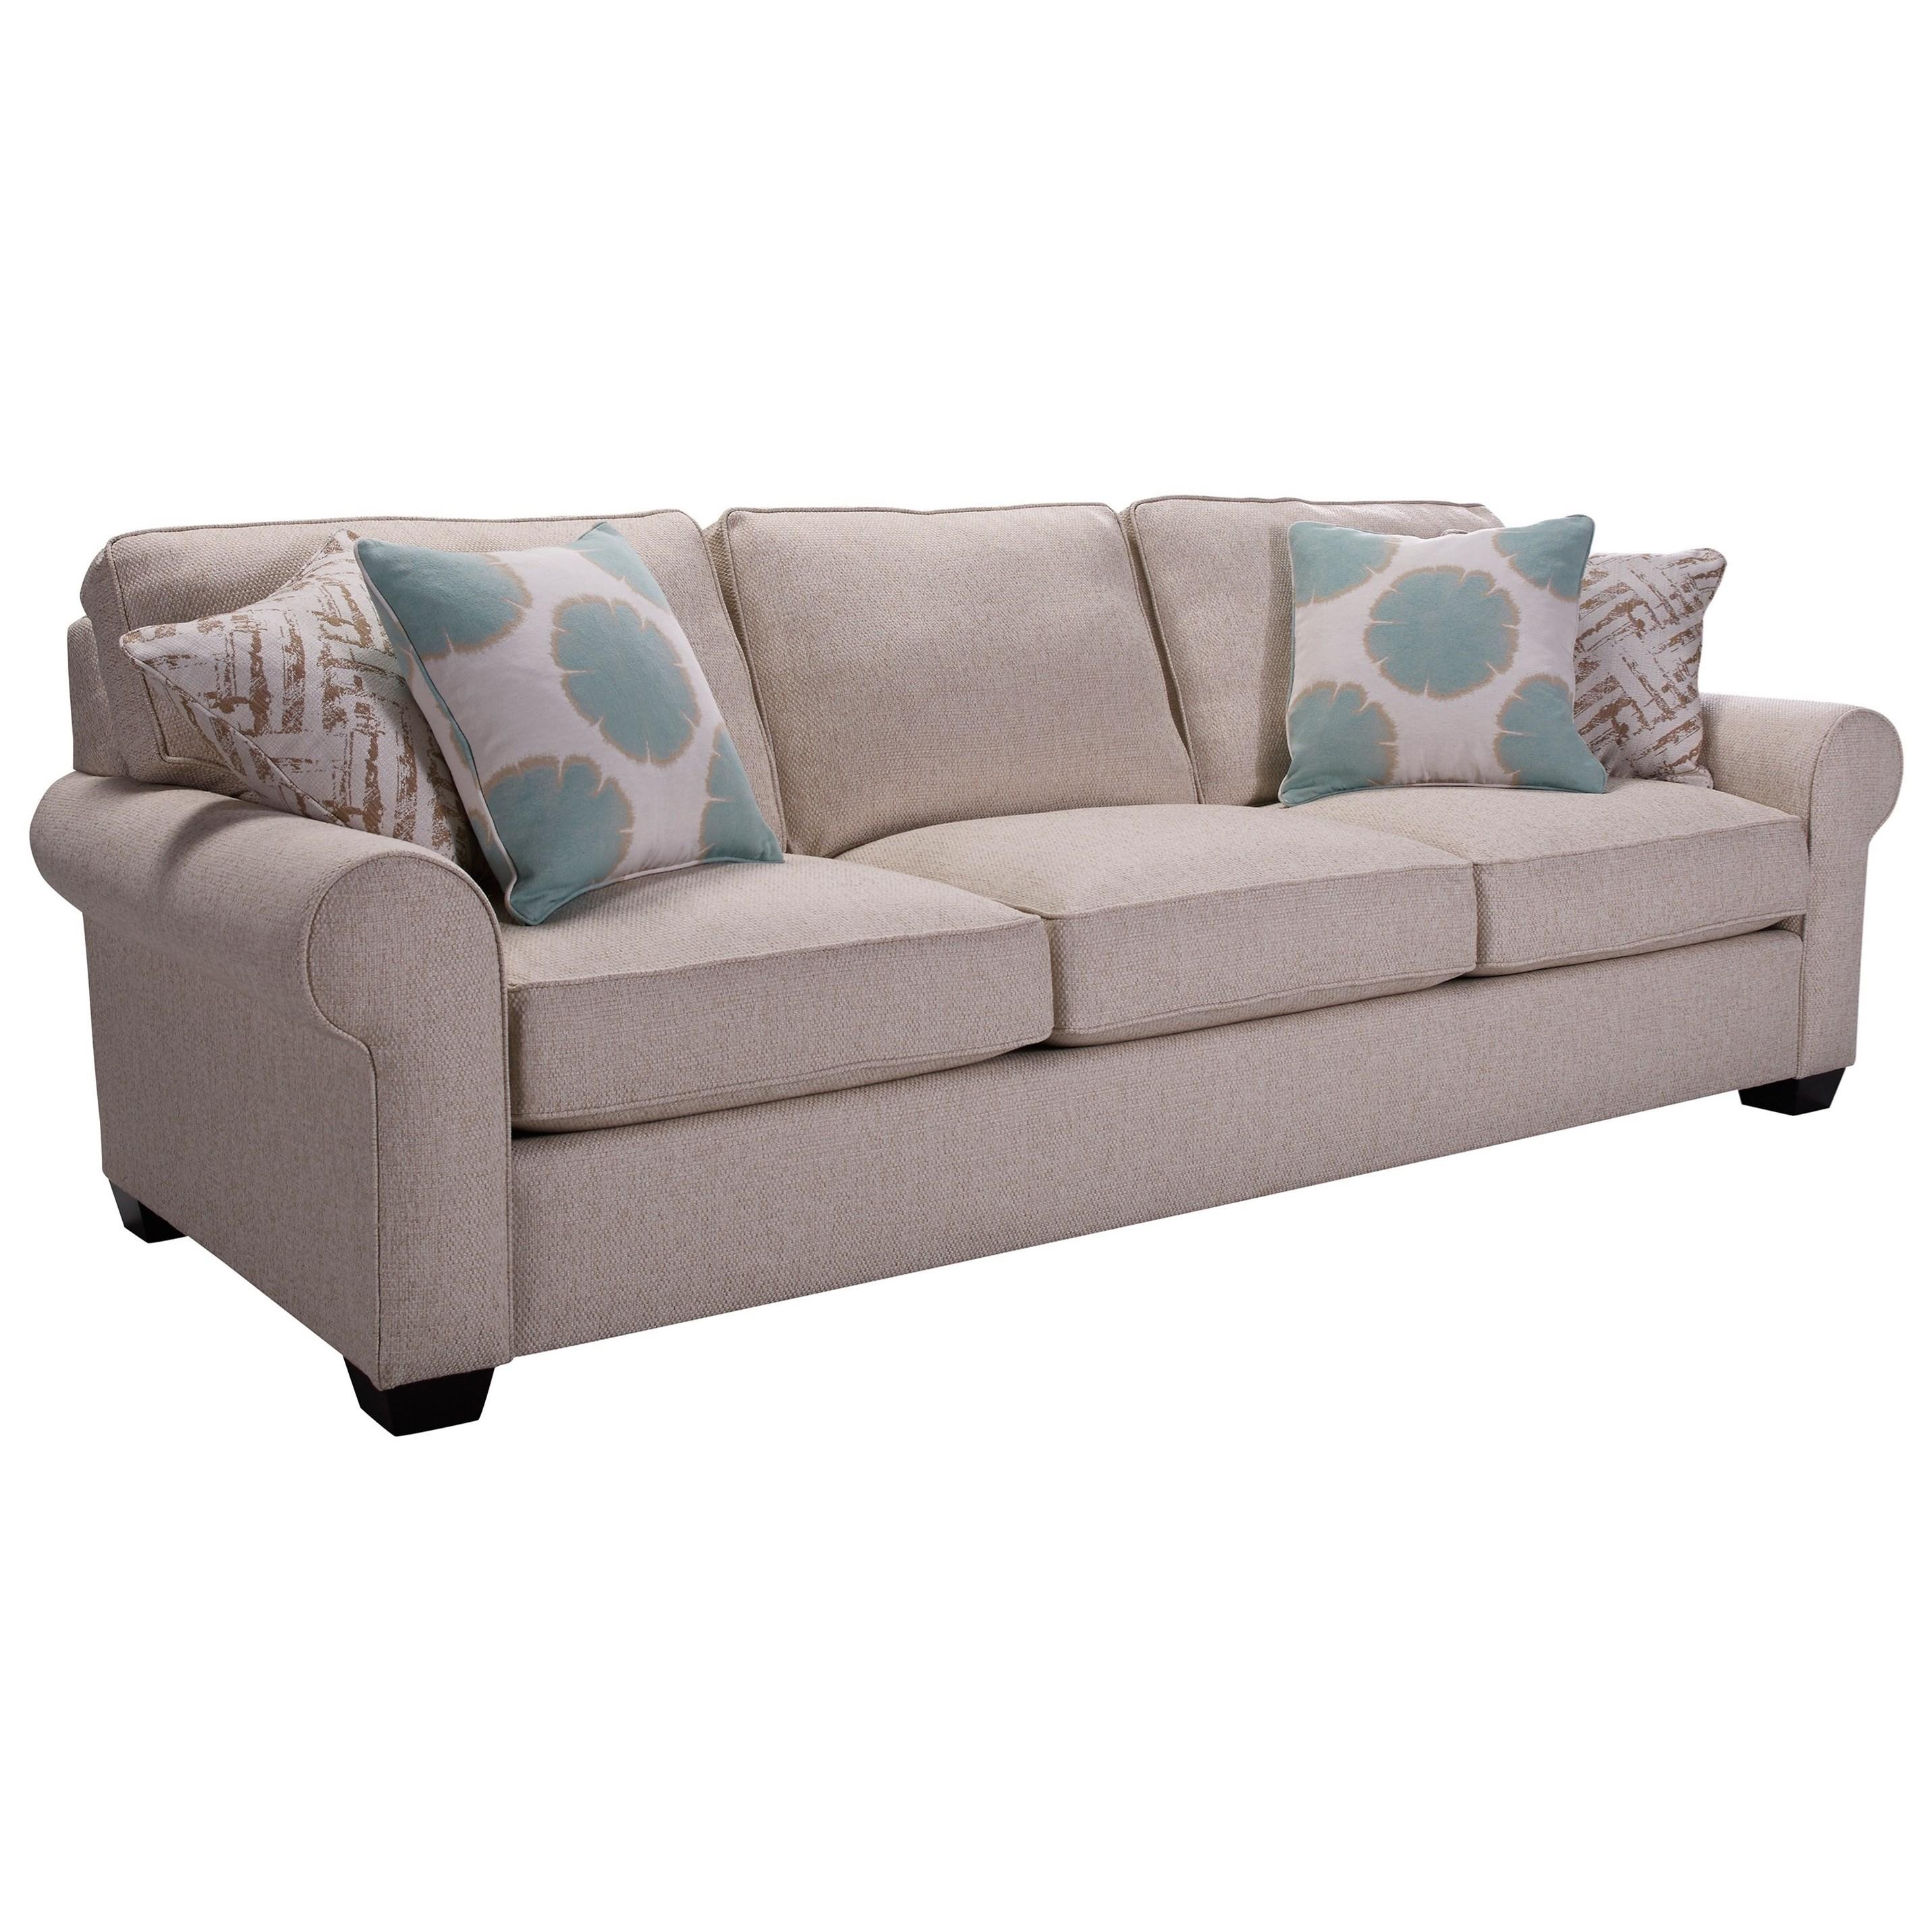 Broyhill Furniture IsadoreSofa